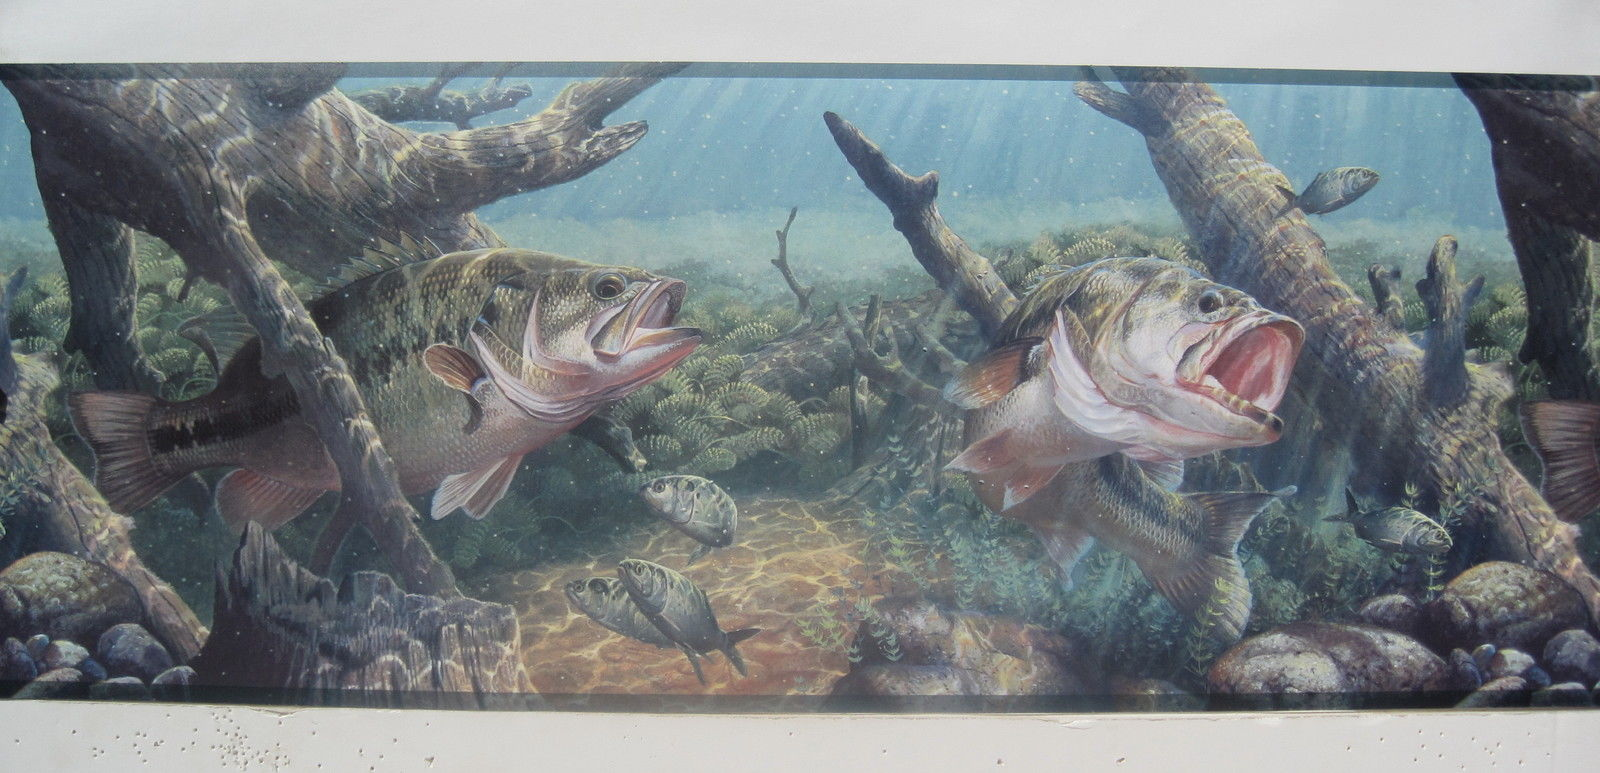 BASS FISHING FRESH WATER FISHING Wallpaper Border 9 1600x773